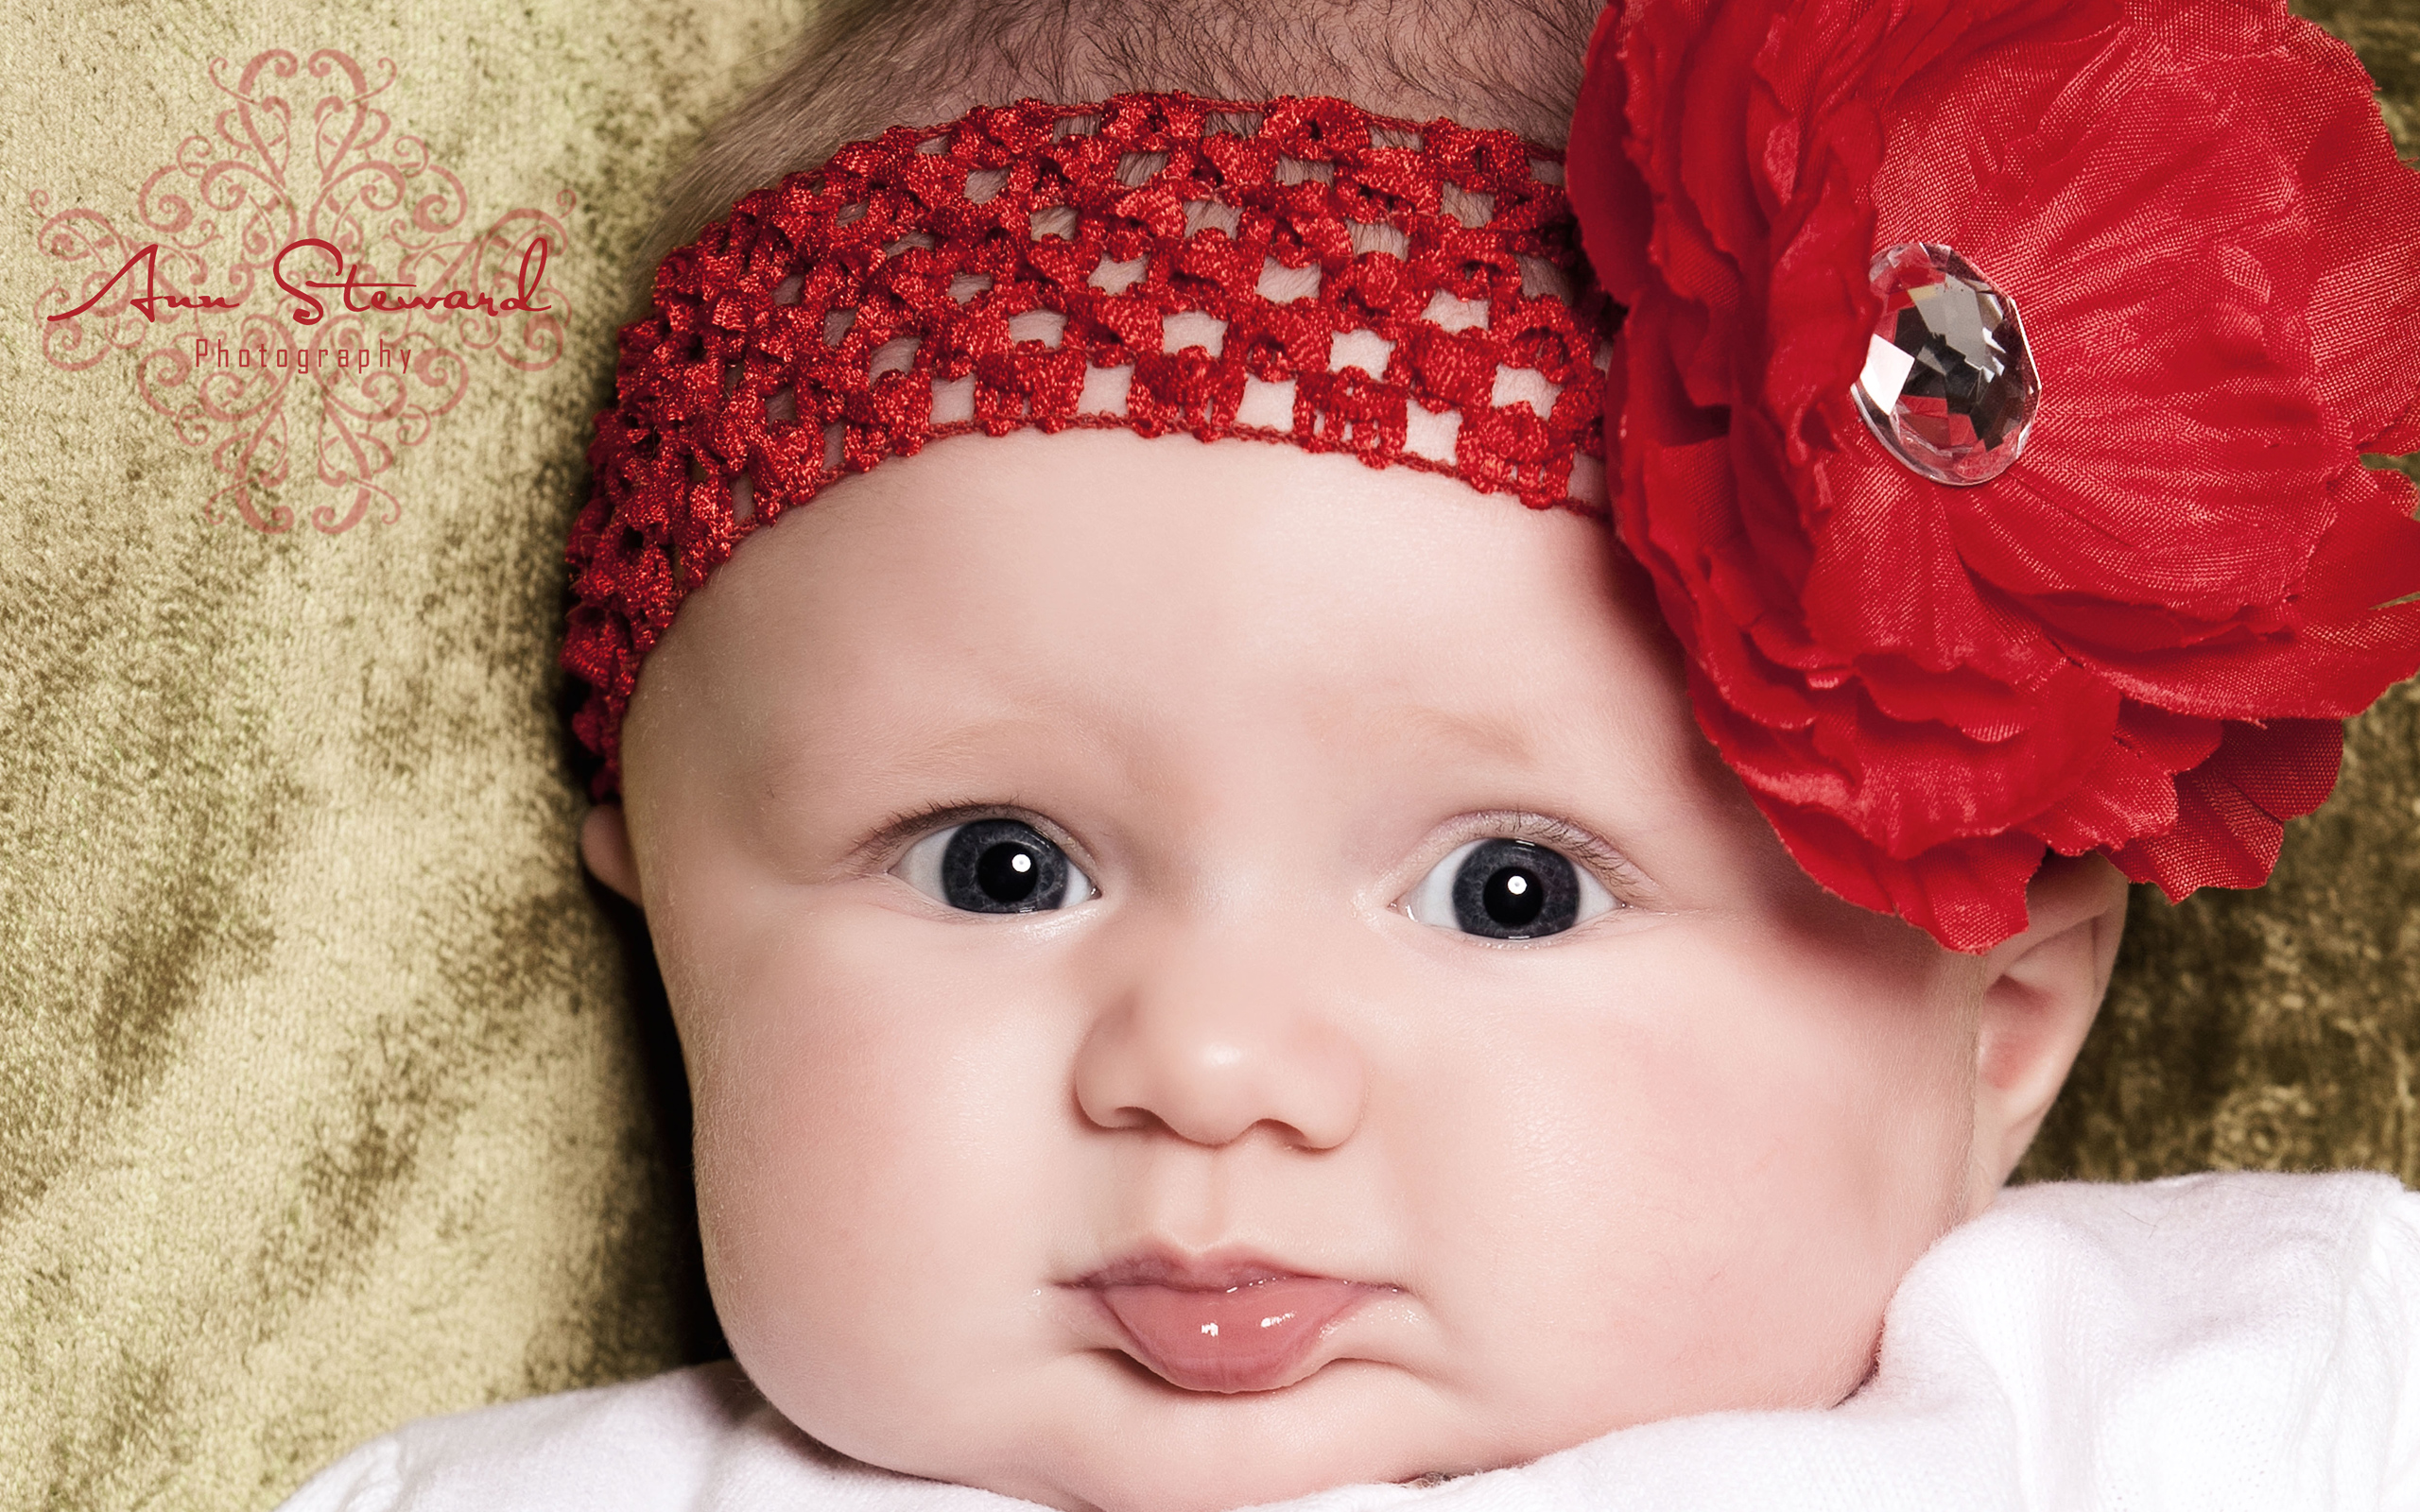 Headcraft On Cute Baby - Headcraft On Cute Baby